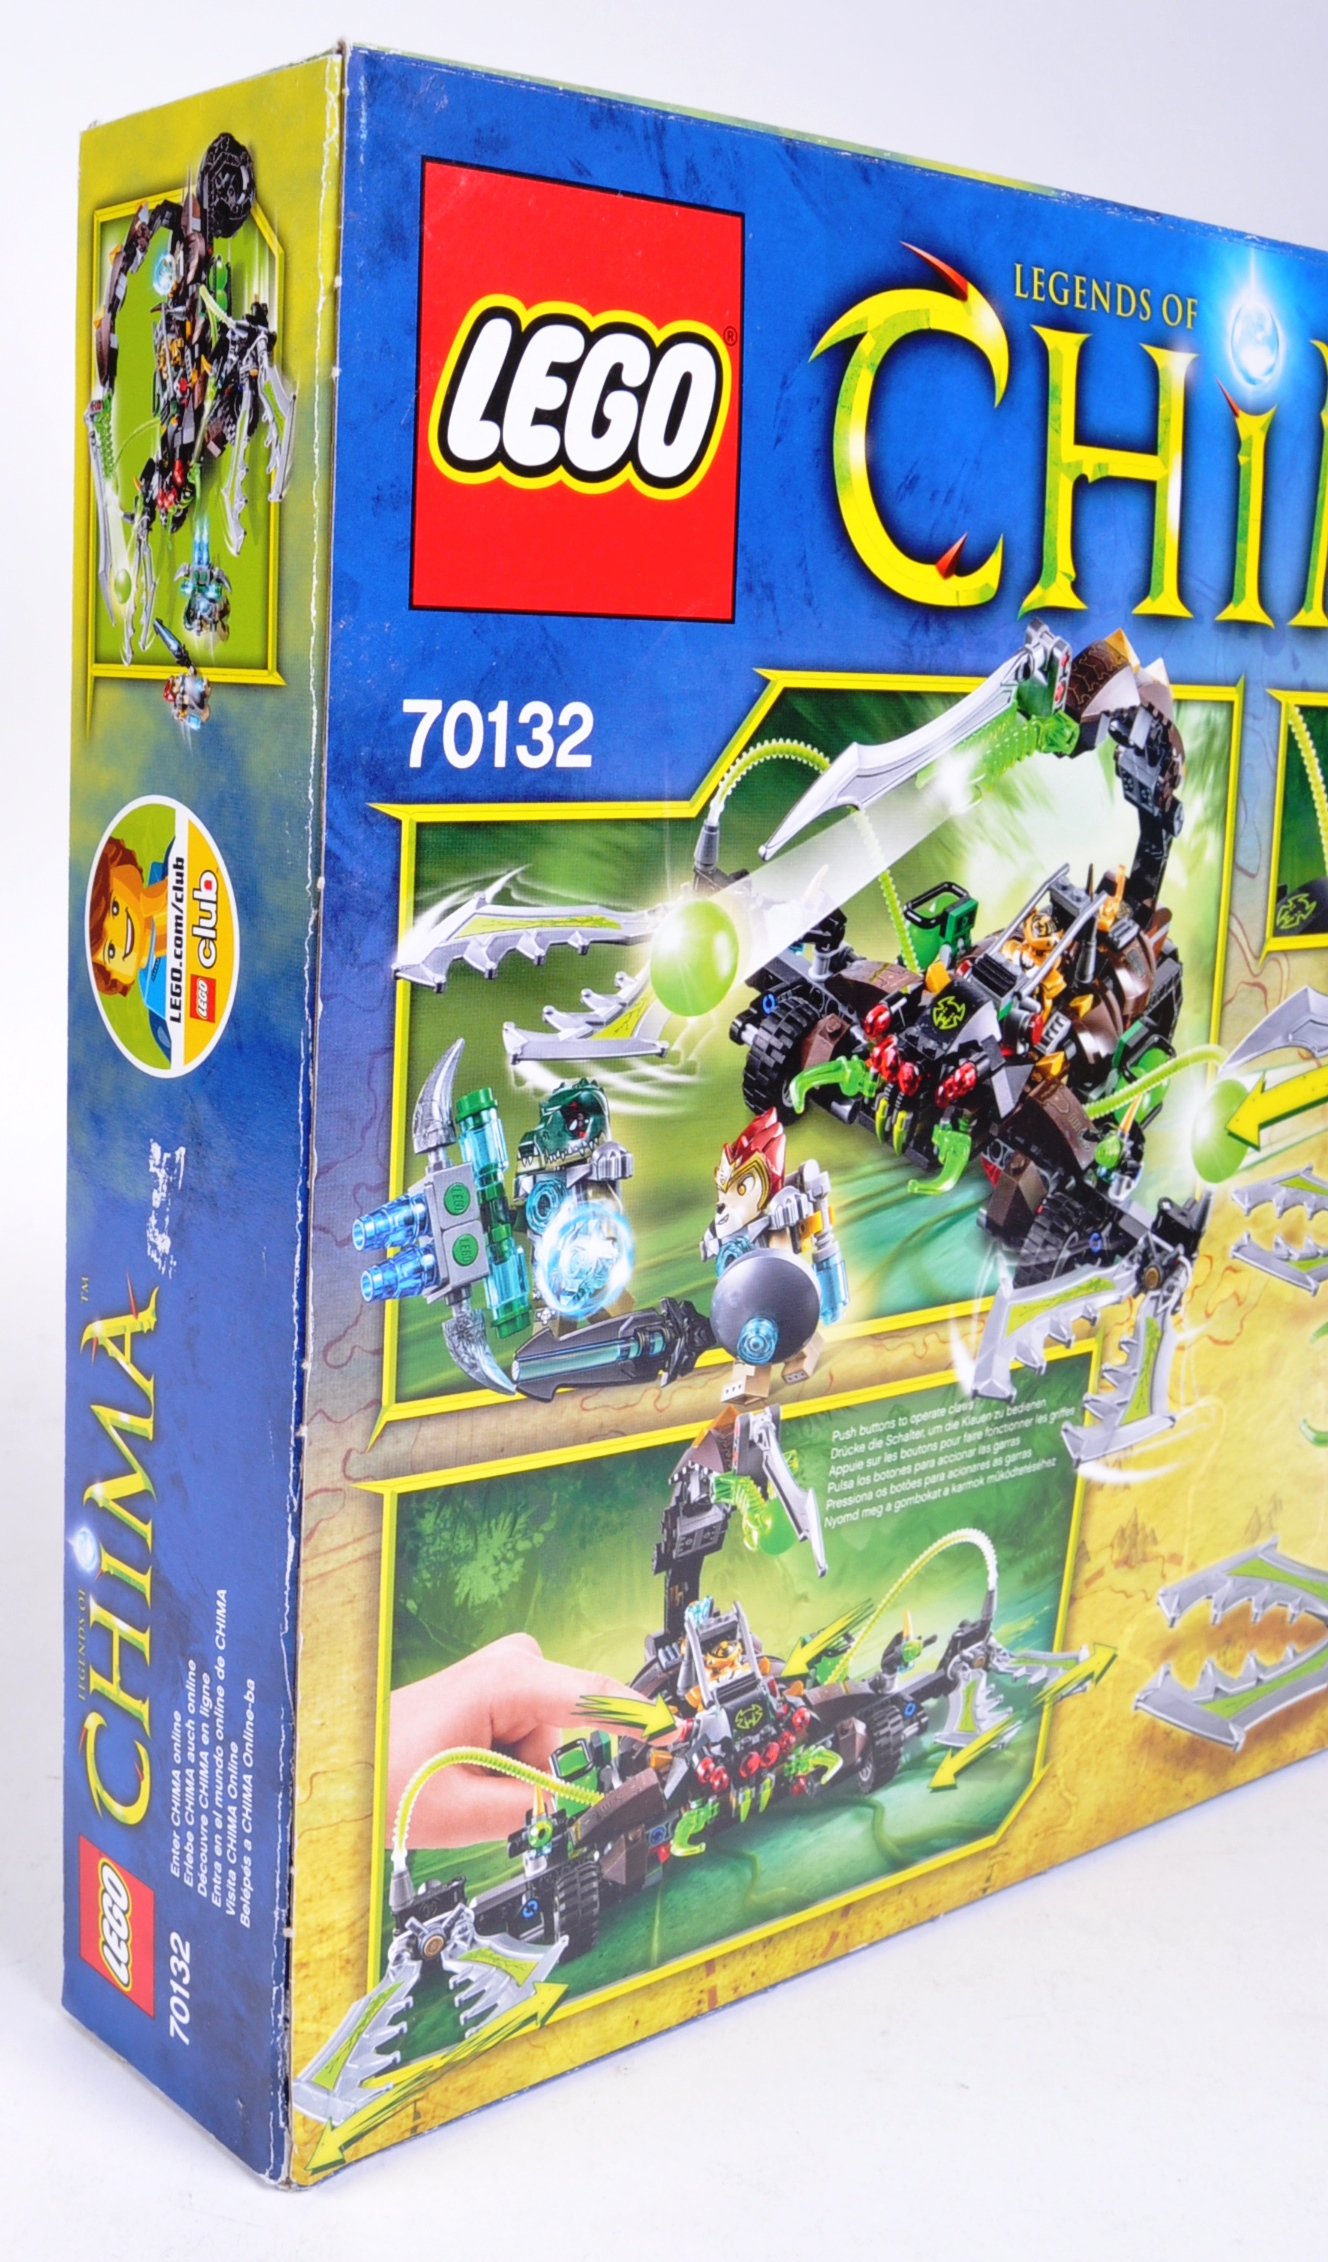 LEGO SETS - LEGENDS OF CHIMA - 70004 / 70132 - Image 6 of 6